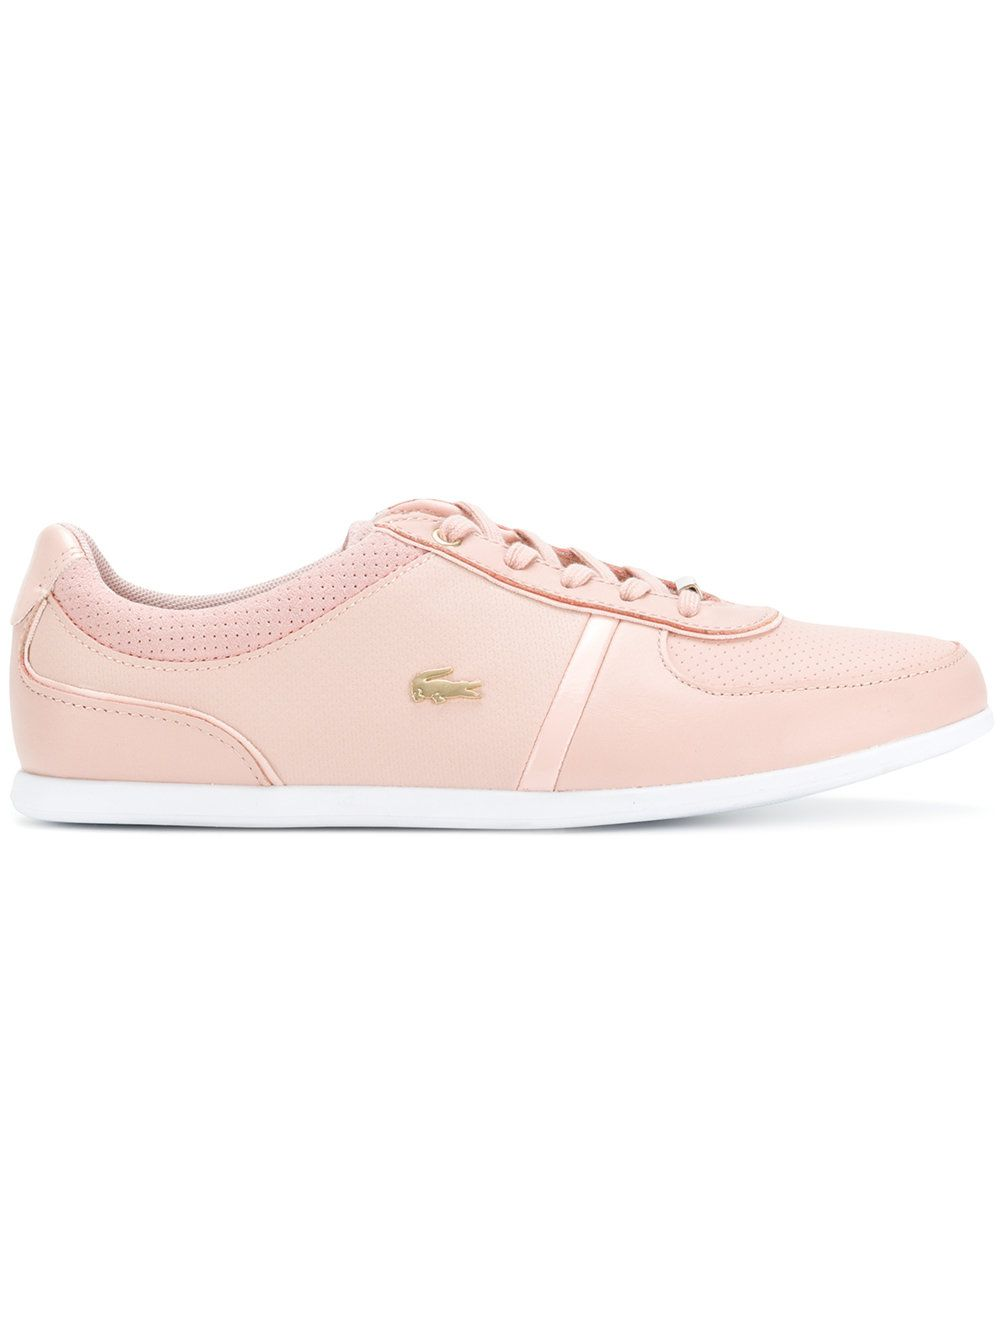 low top sneakers - Pink & Purple Lacoste 7DWlvwb3D